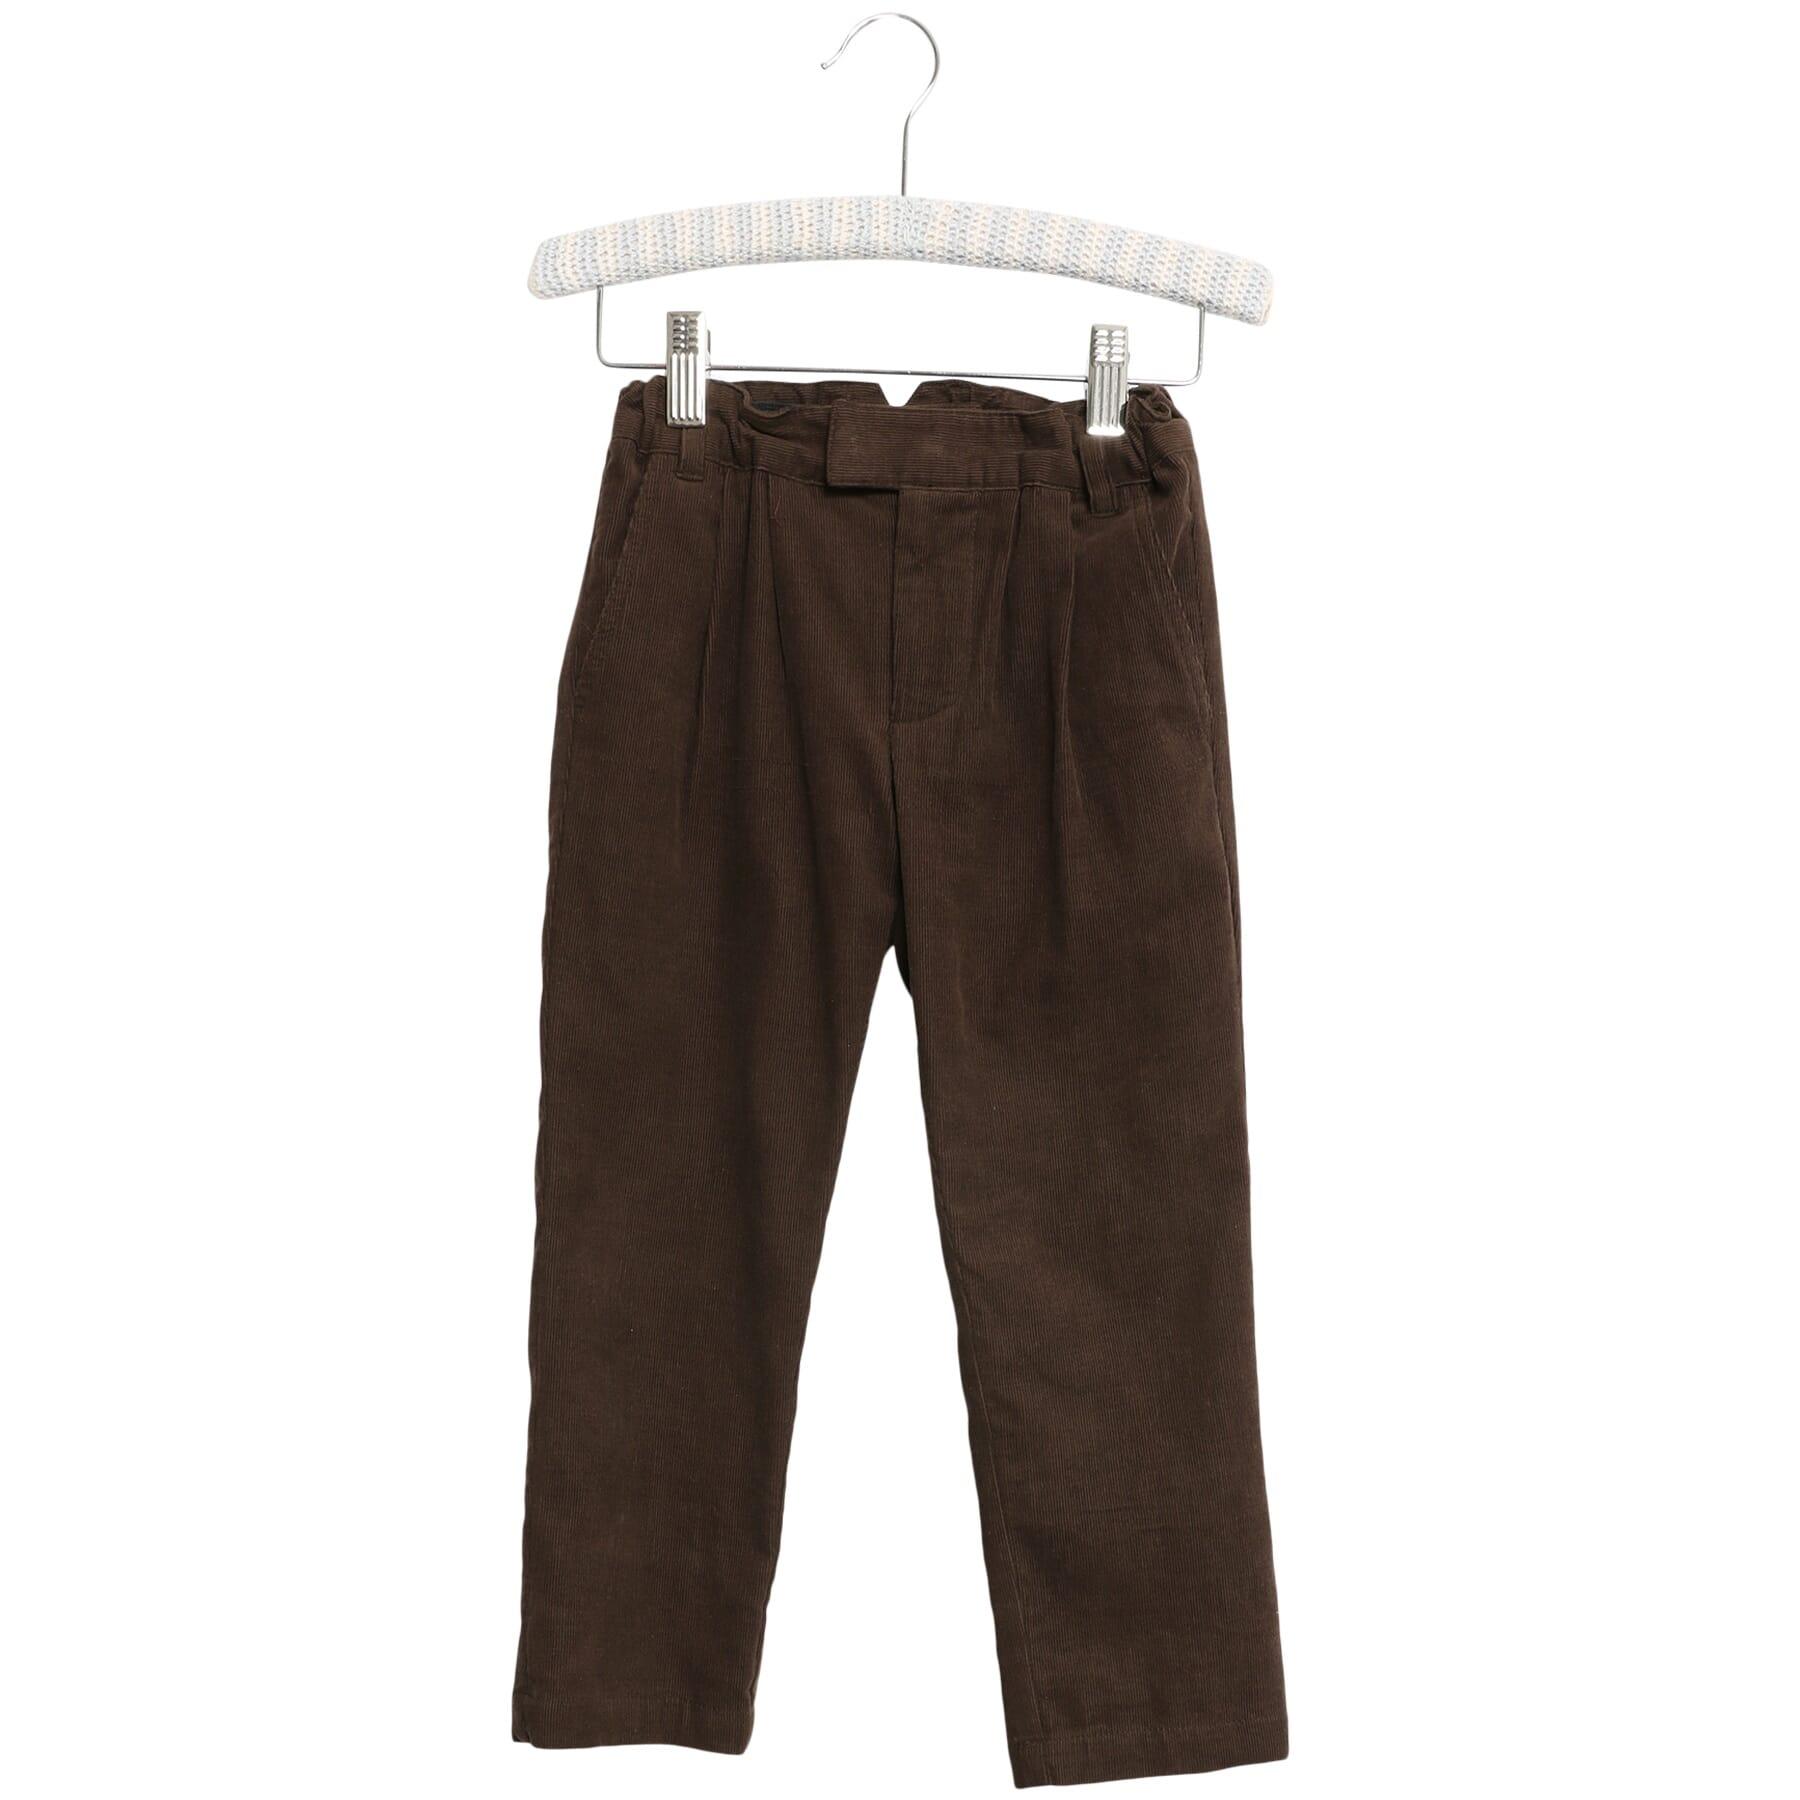 Limar Pants grey melange Hummel Rumpetroll